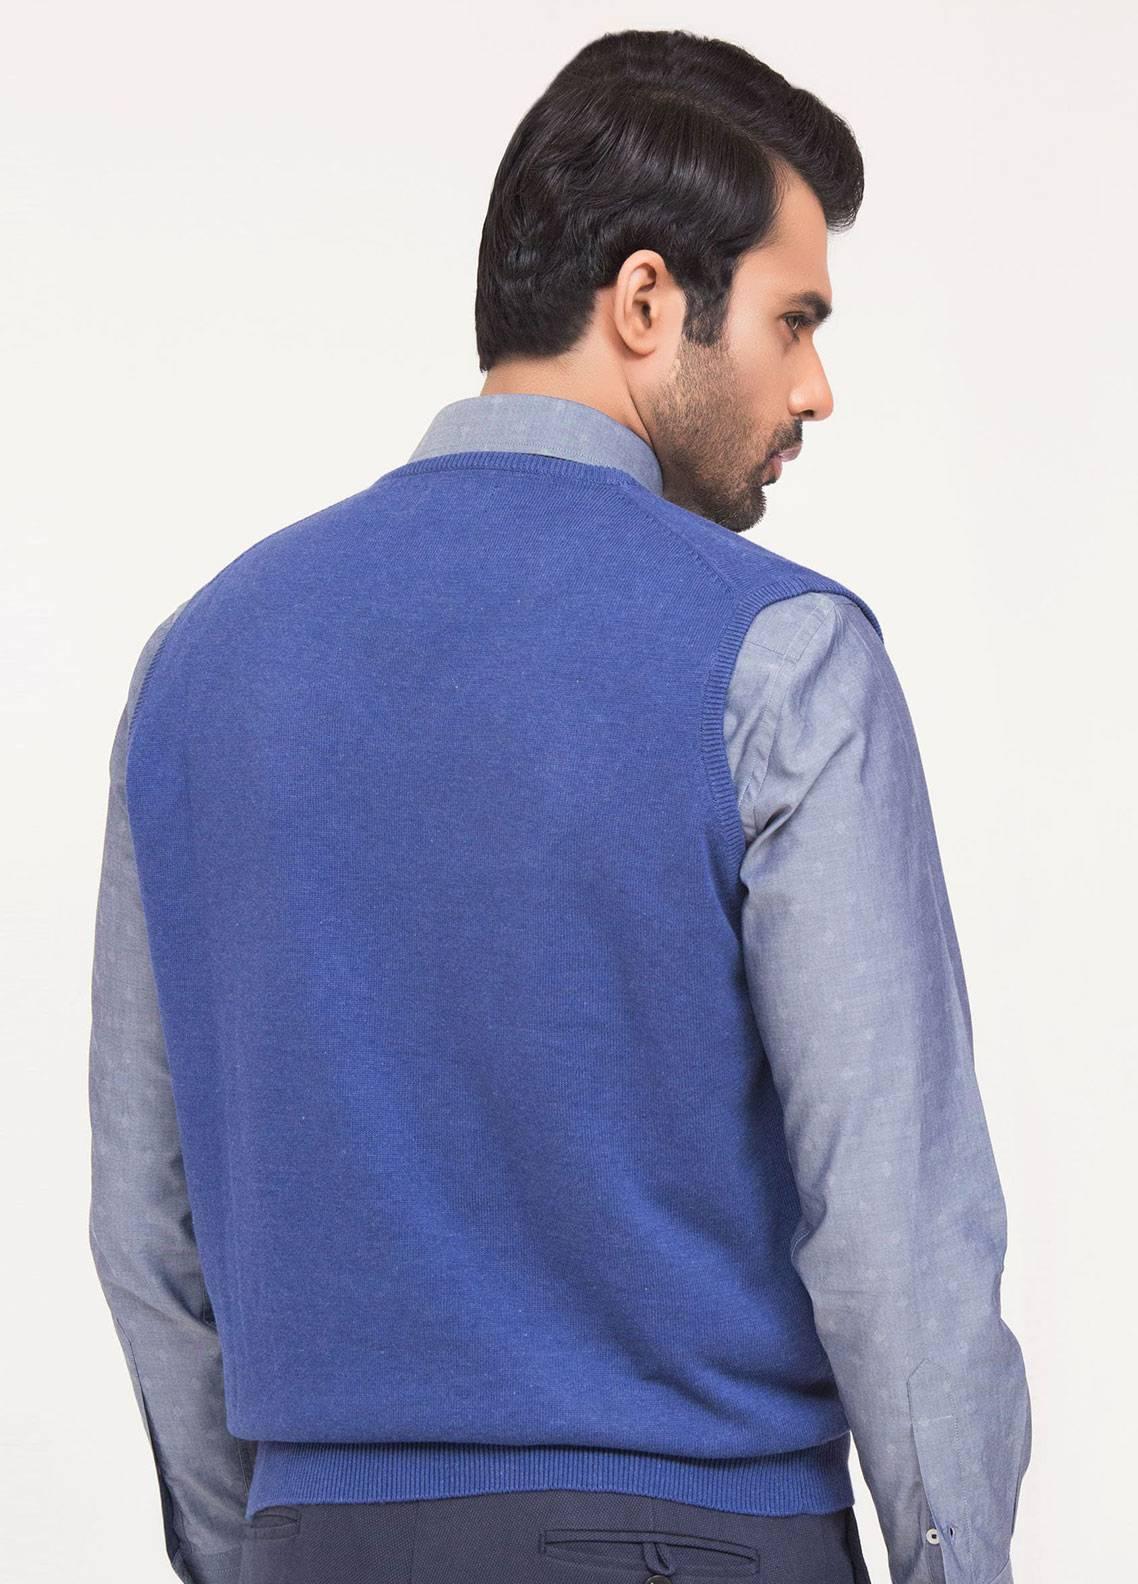 Brumano Cotton Sleeveless V-Neck Sweaters for Men - Blue SL-320